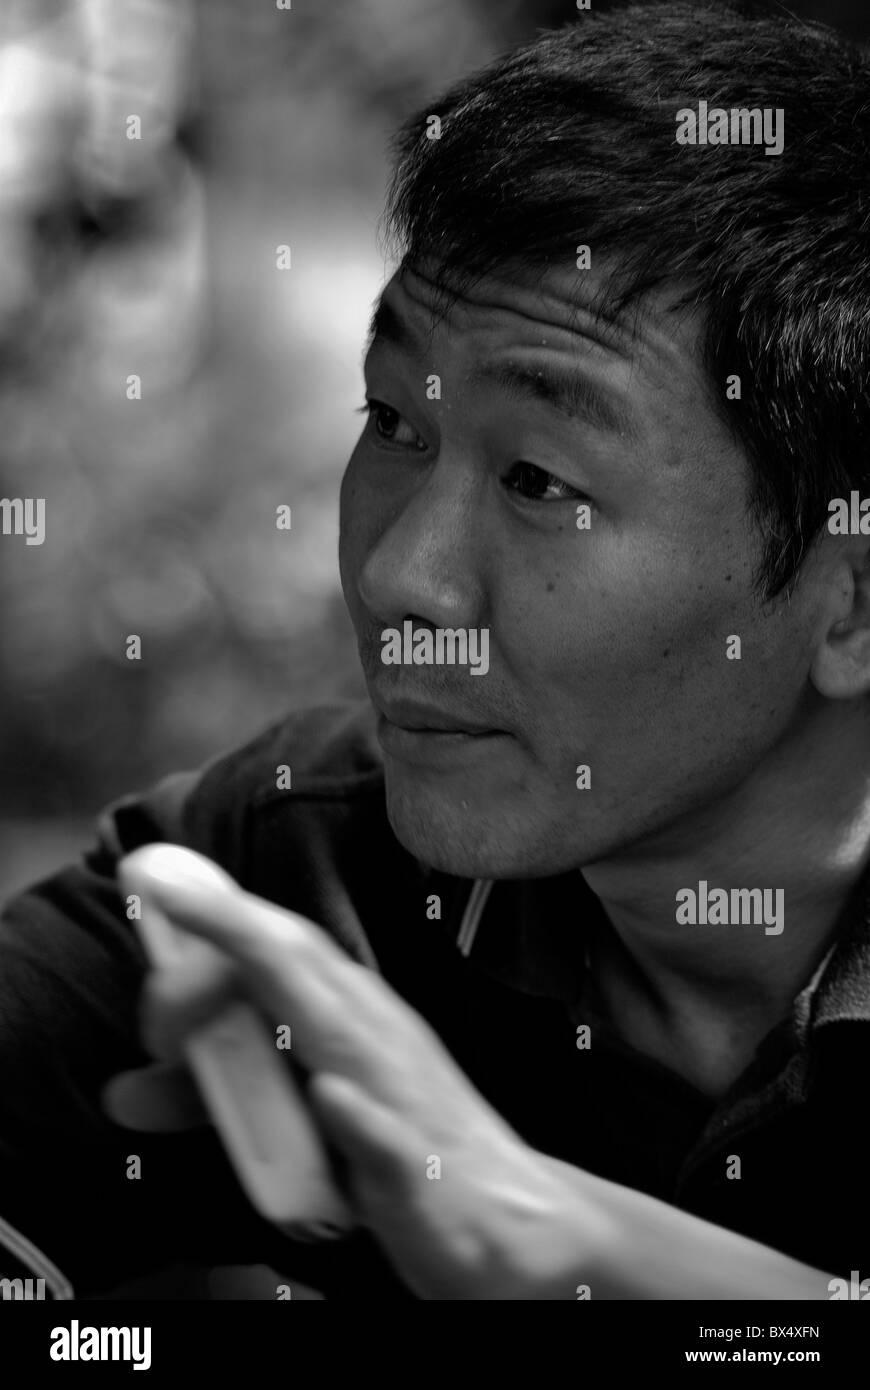 Sichuan, China - Village mayor praising development programs - Stock Image